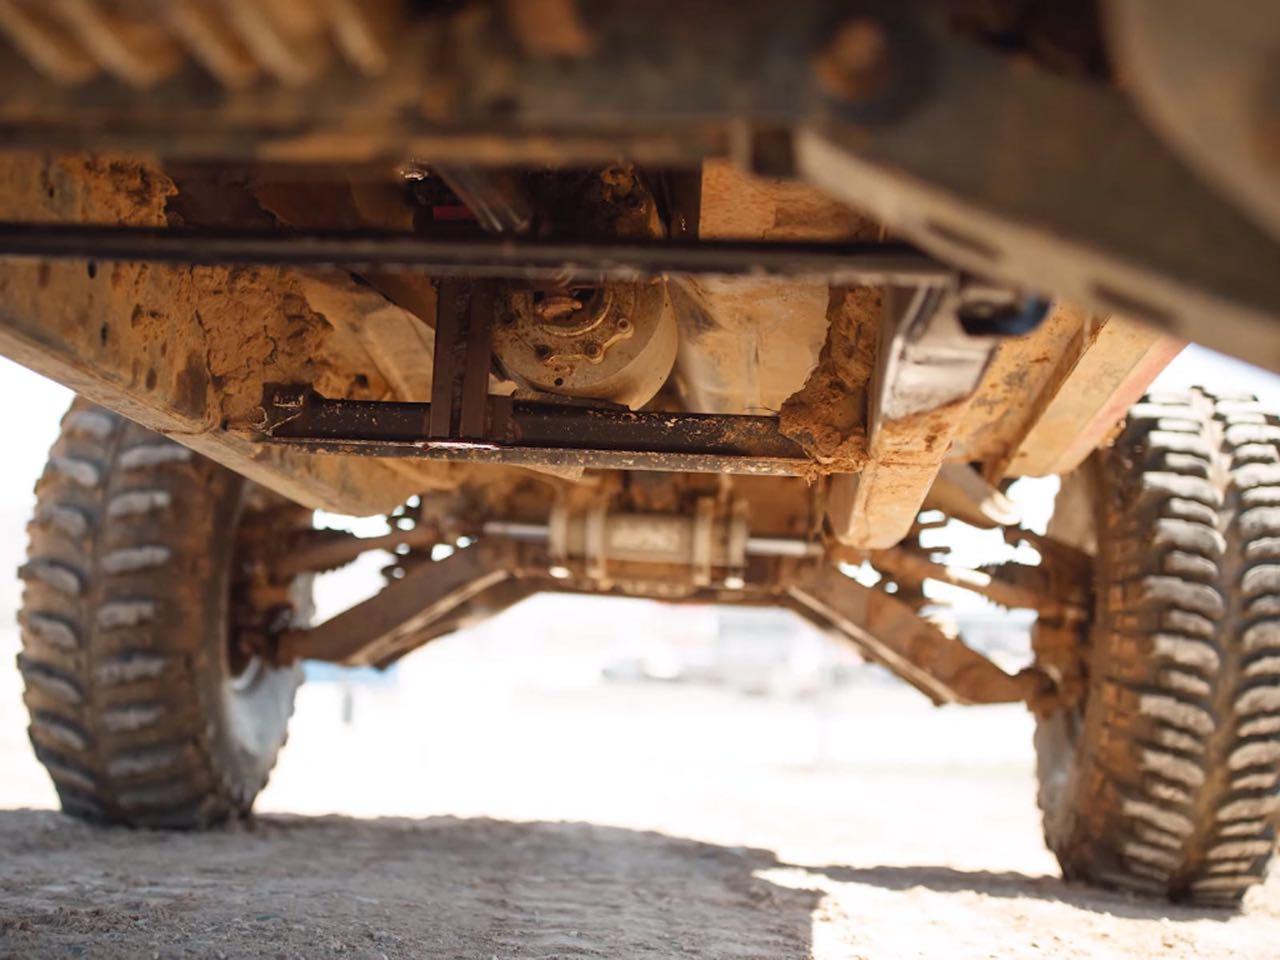 The Mudmaro : La fusion d'un Hummer H1 et d'une Camaro ! 6